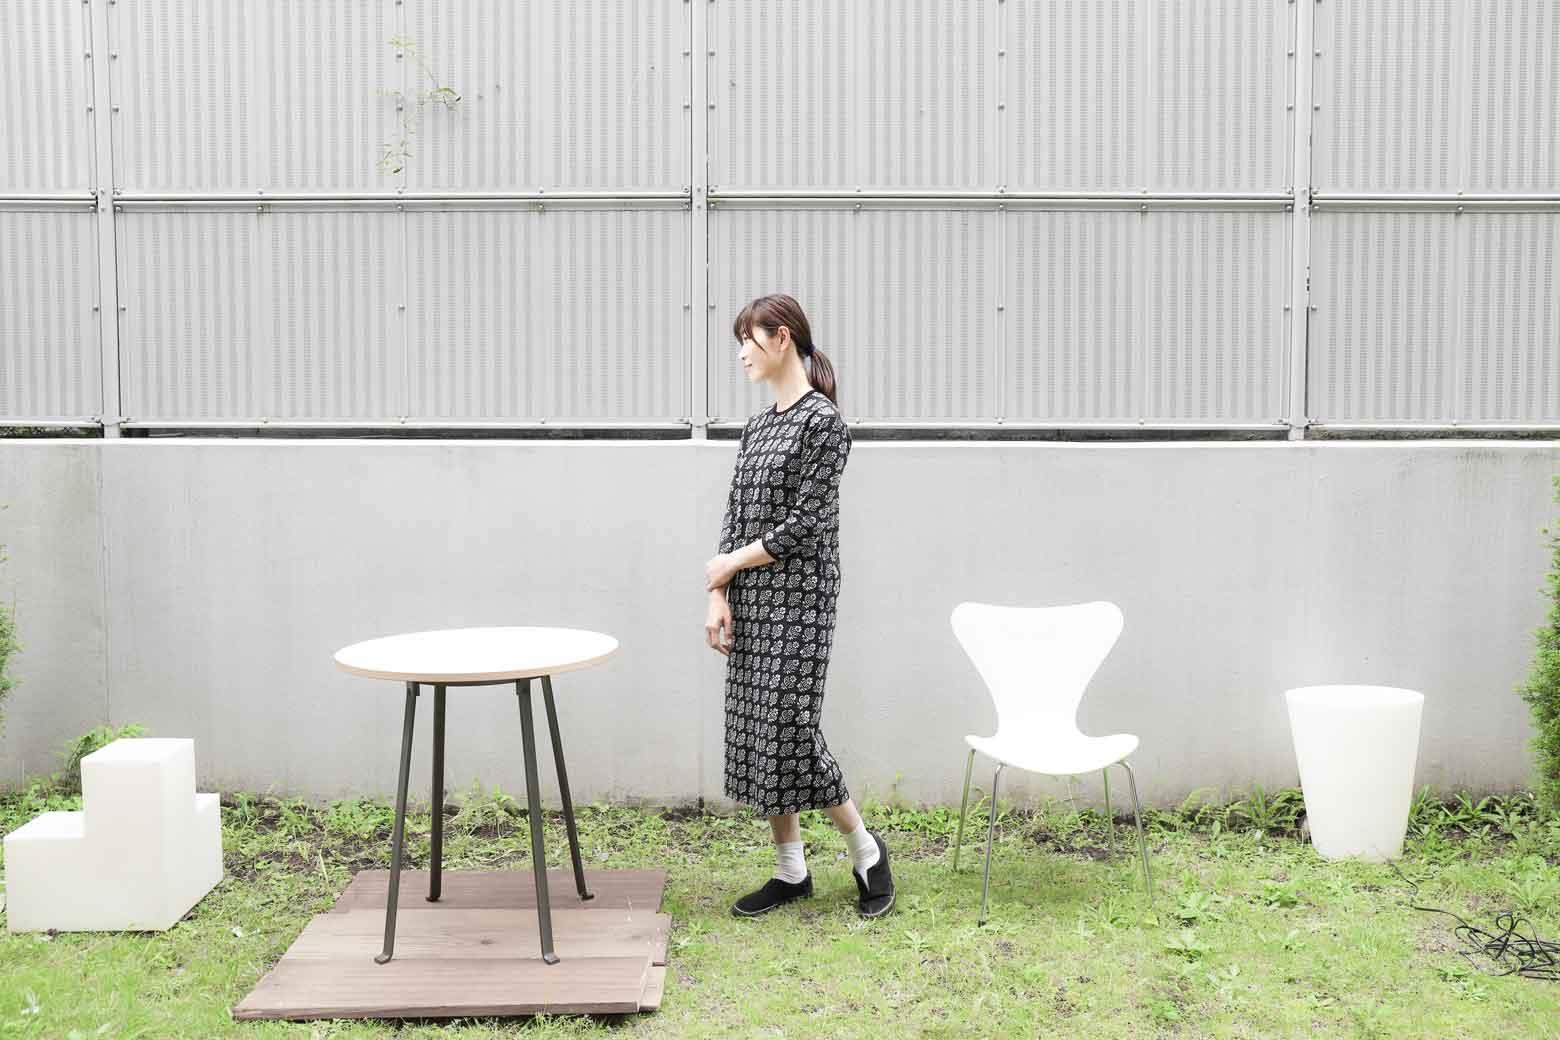 marimekko Hedelmakori one-piece dress 140size/マリメッコ ヘデルマコリ ワンピース 140サイズ